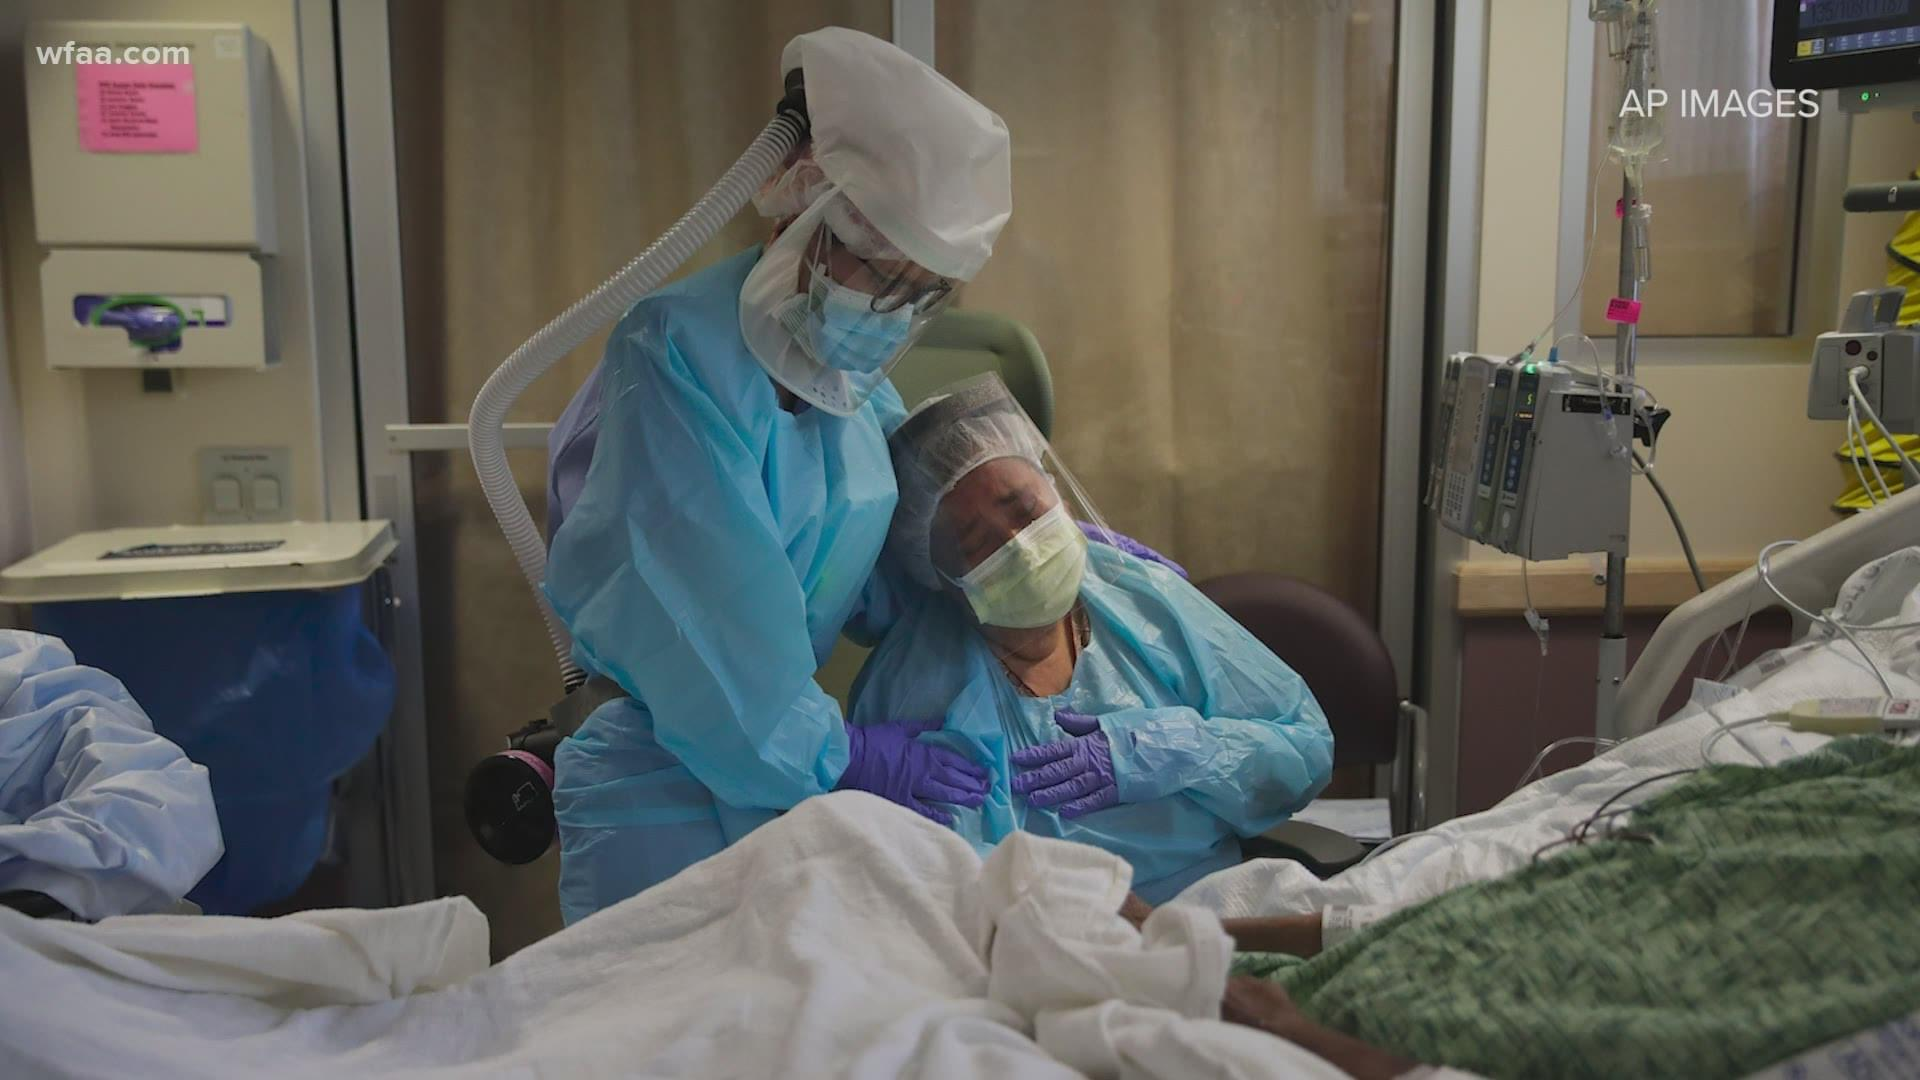 Chris Krok Show: This Nurse is FED UP!